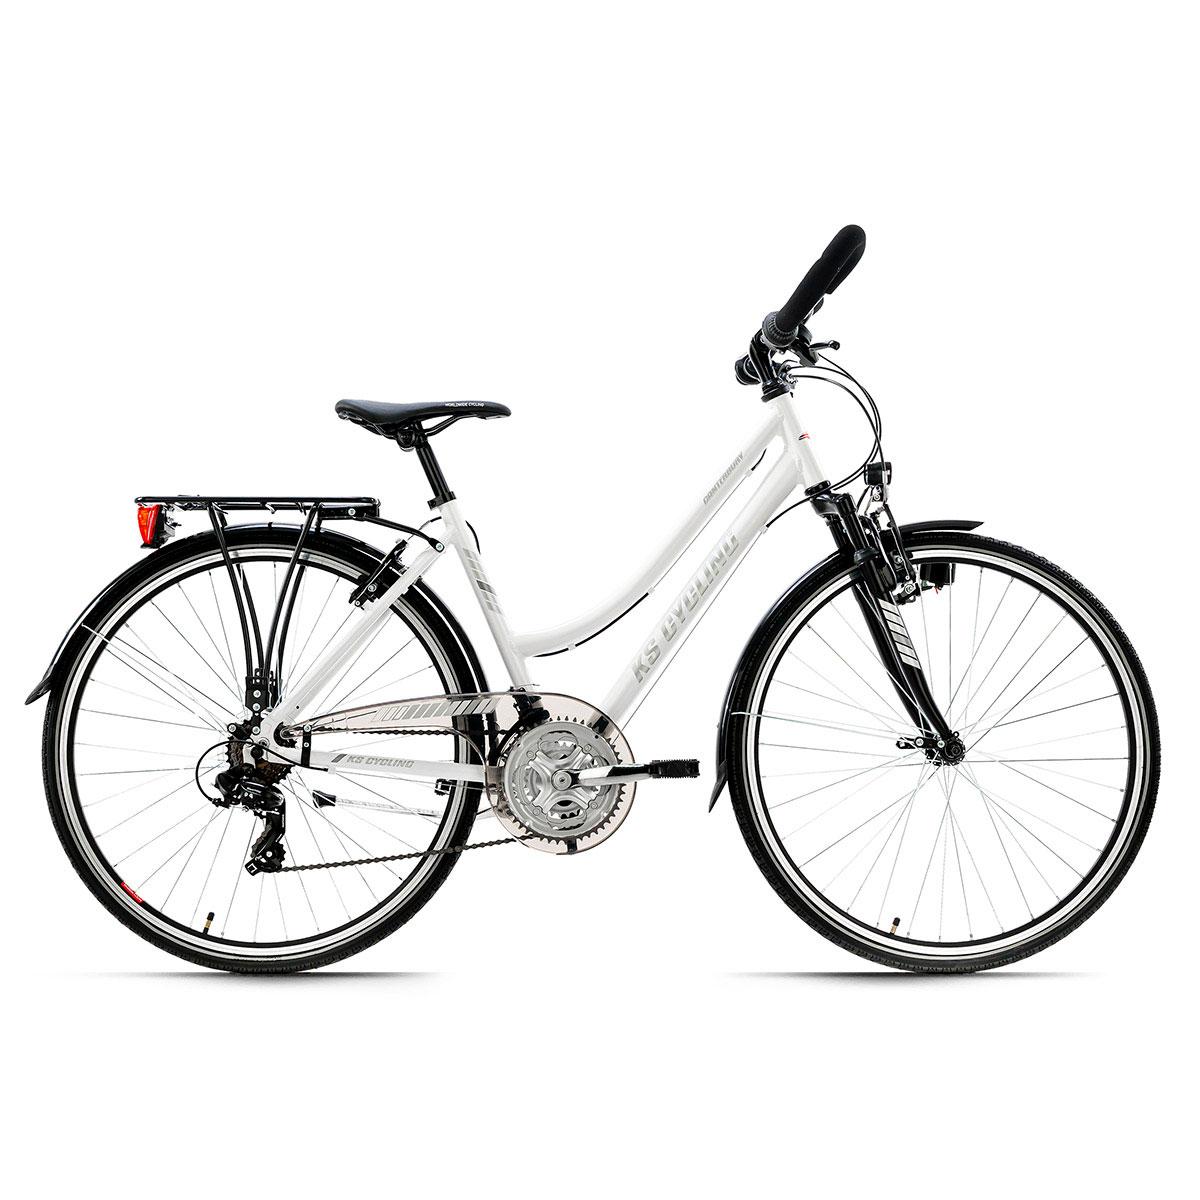 "Trekkingrad ""Canterbury"", Damen, Multilenker, 53cm, weiß matt Multipositionslenker | weiß matt | Damen | 53 cm"